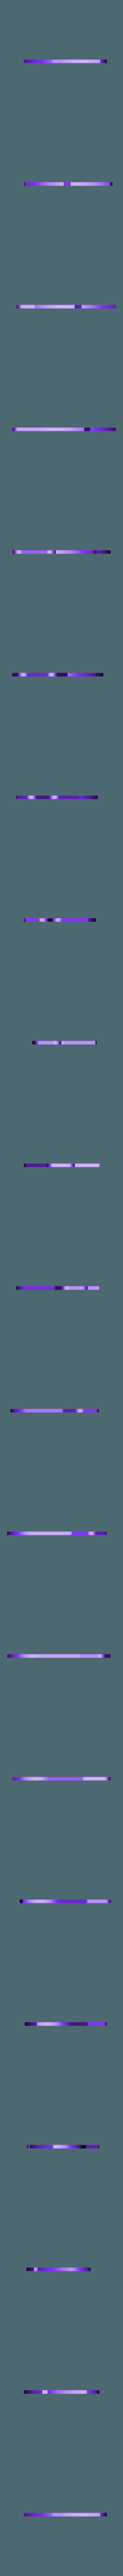 Pelicans_white.STL Download free STL file Minimal Multi-color NBA coasters • 3D print object, MosaicManufacturing